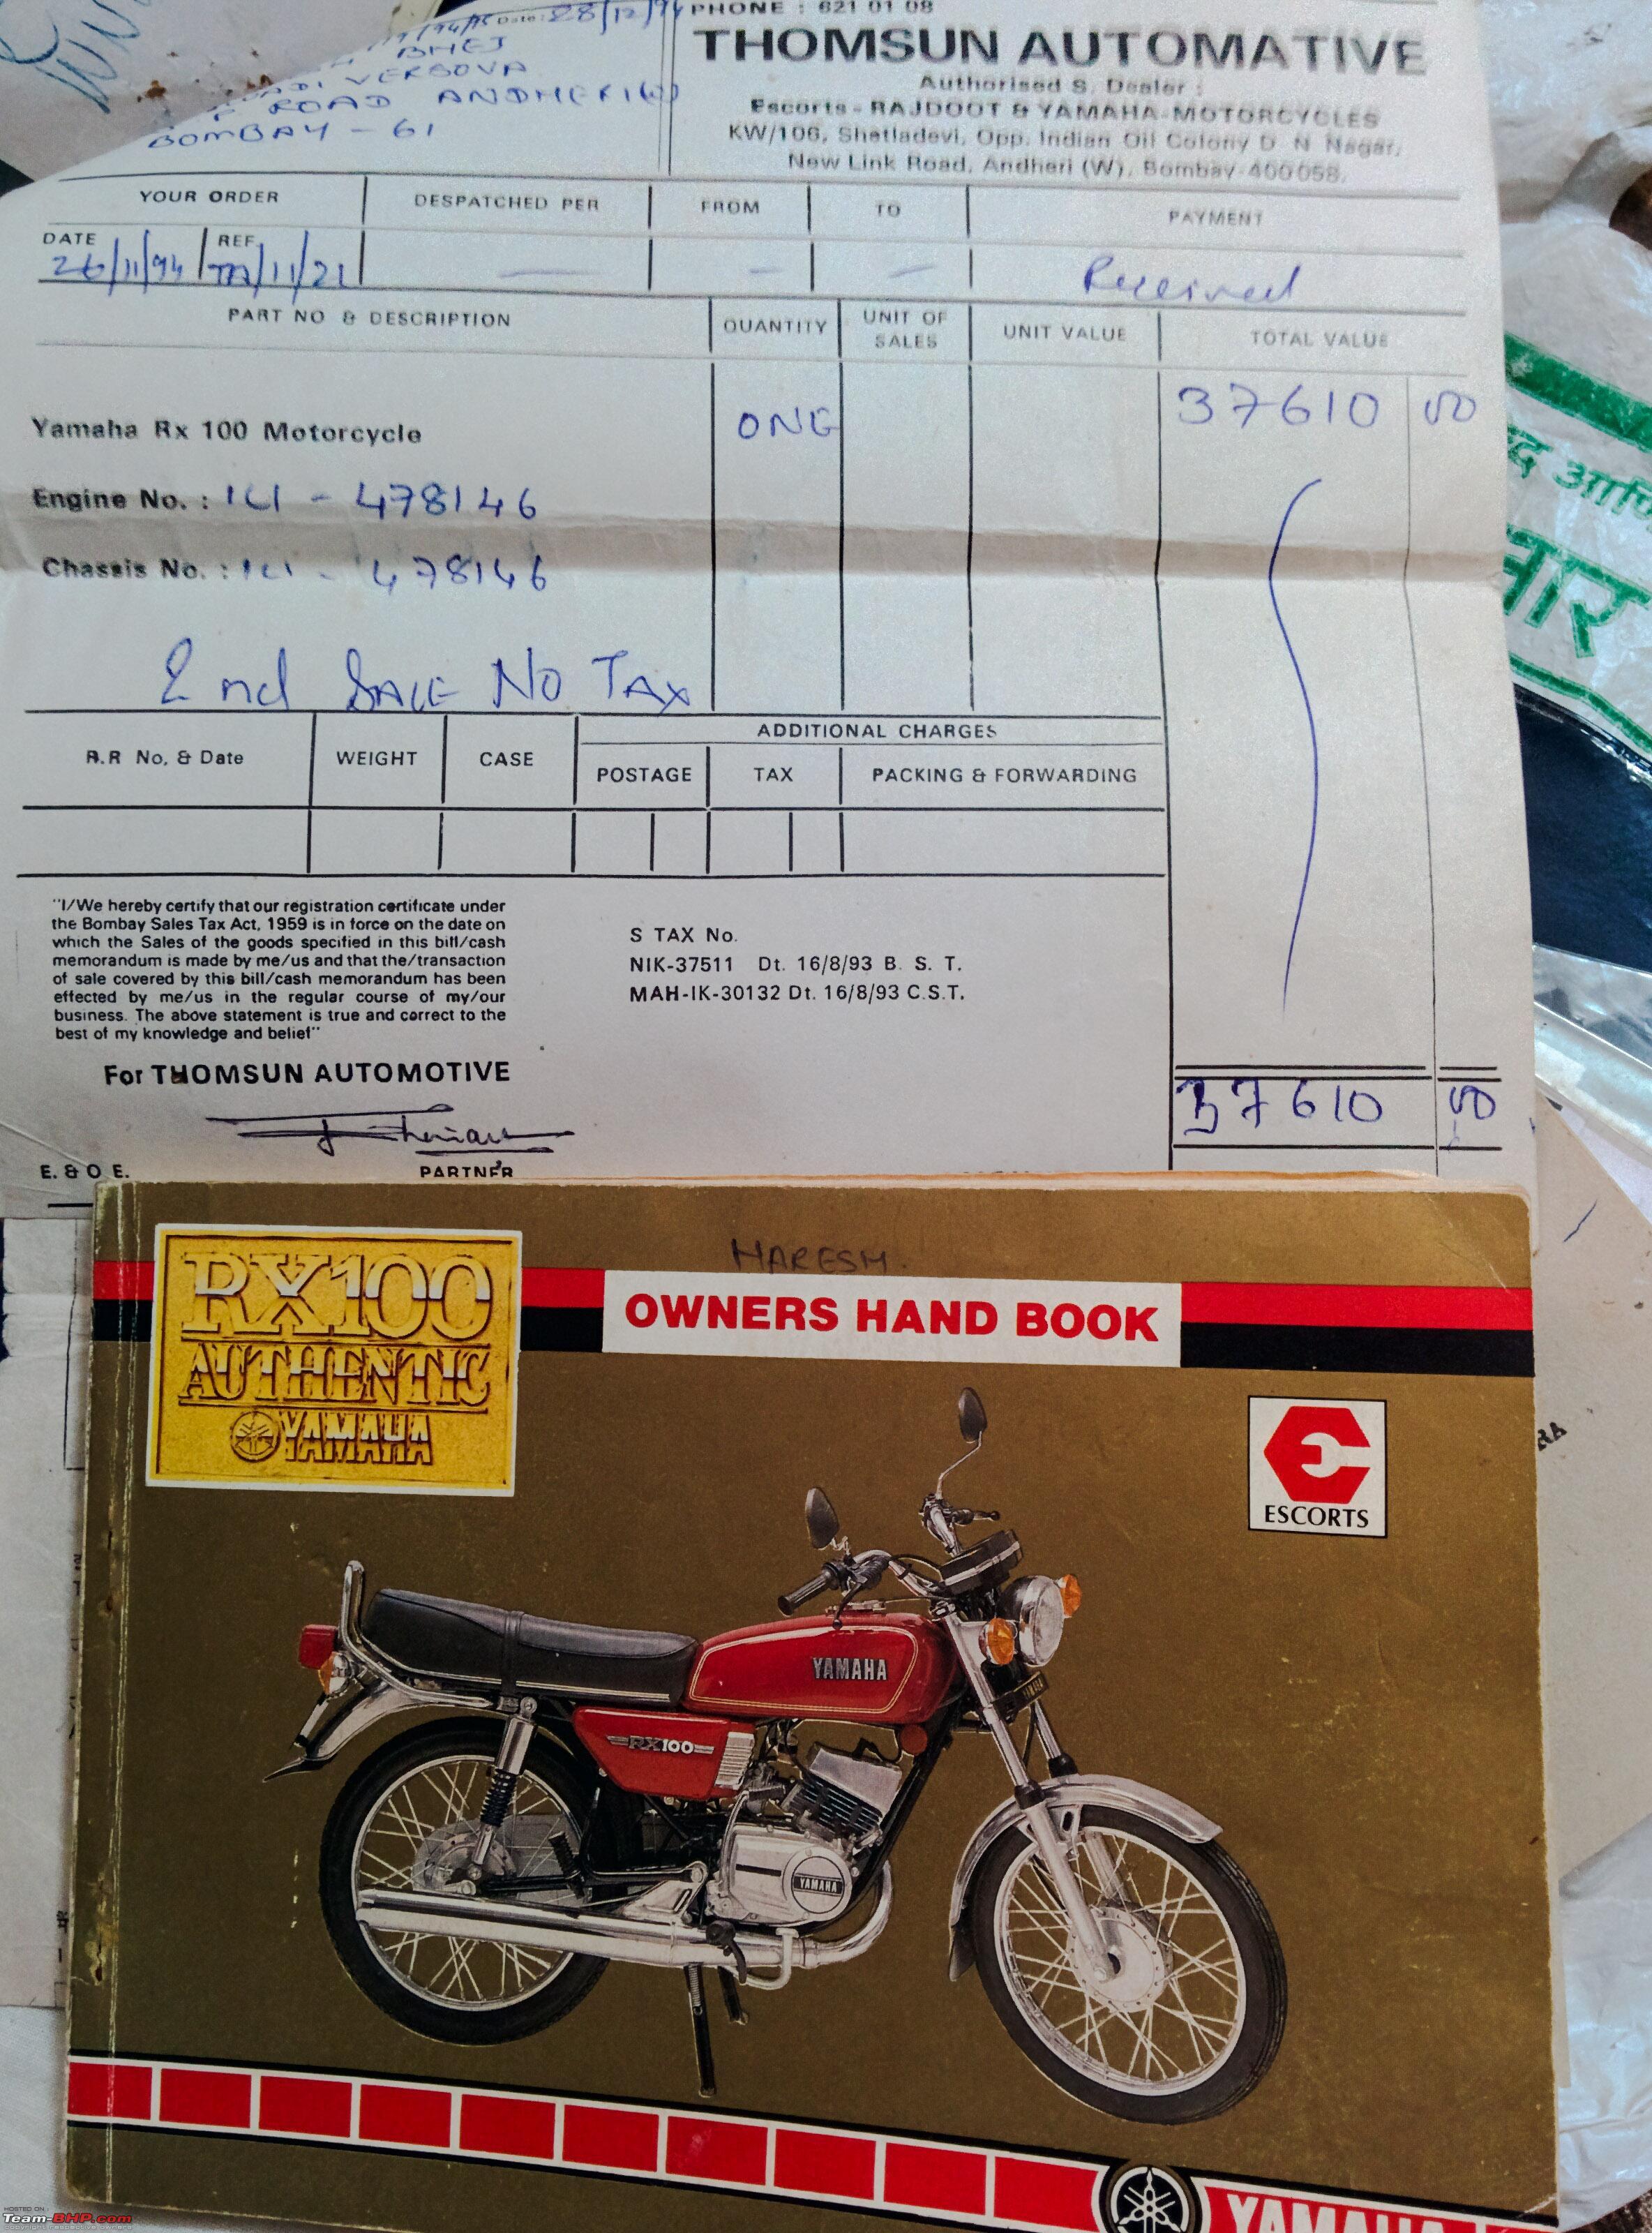 Yamaha RX100: Retro-Modern modifications (alloys, disc brake